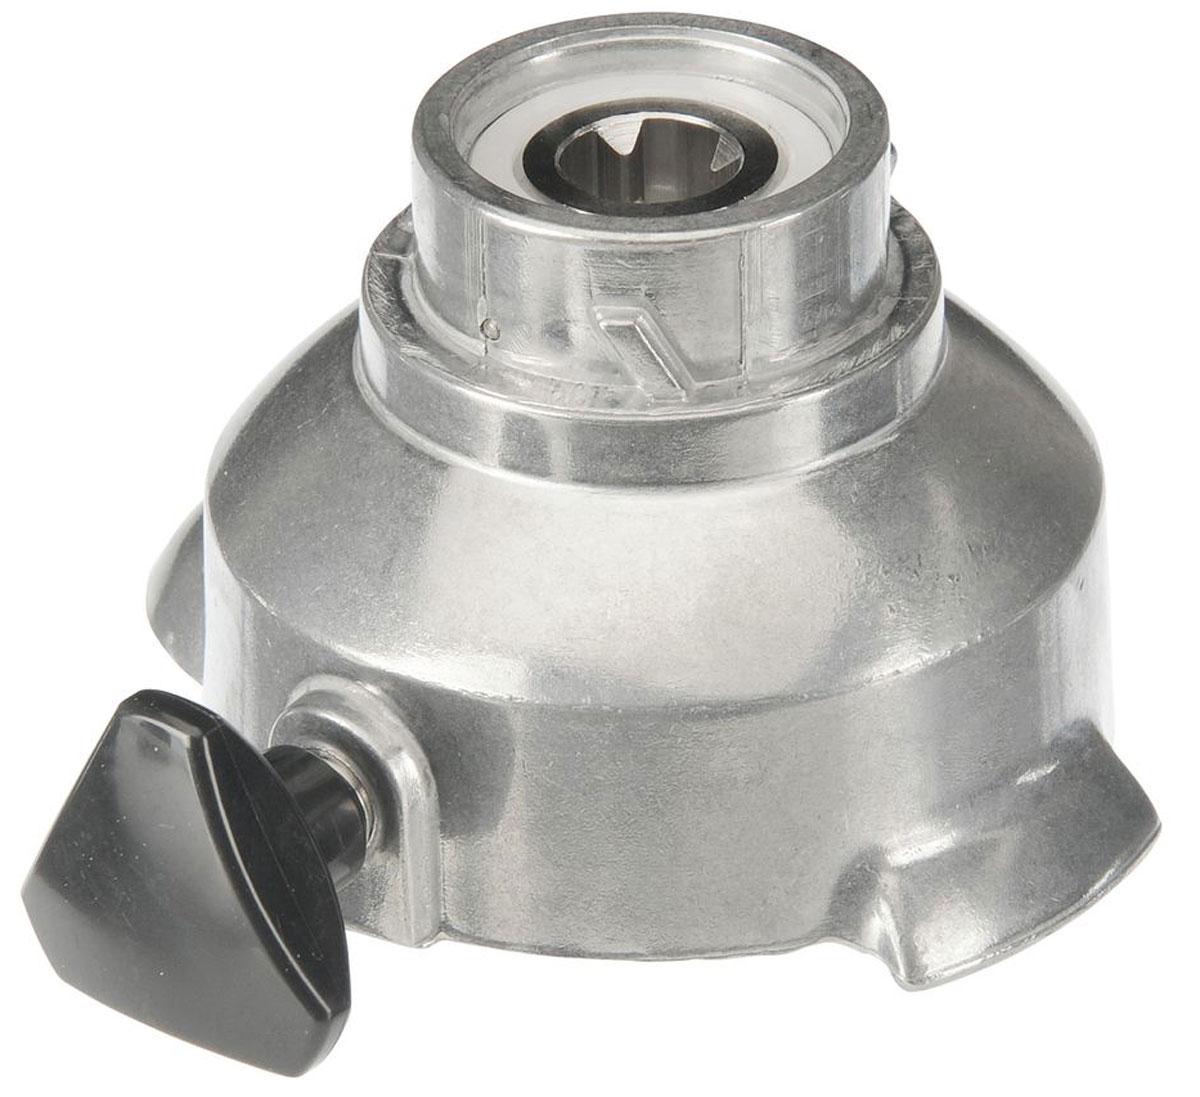 Bosch MUZ8AD1 адаптер для насадок для кухонных комбайнов, Bosch GmbH